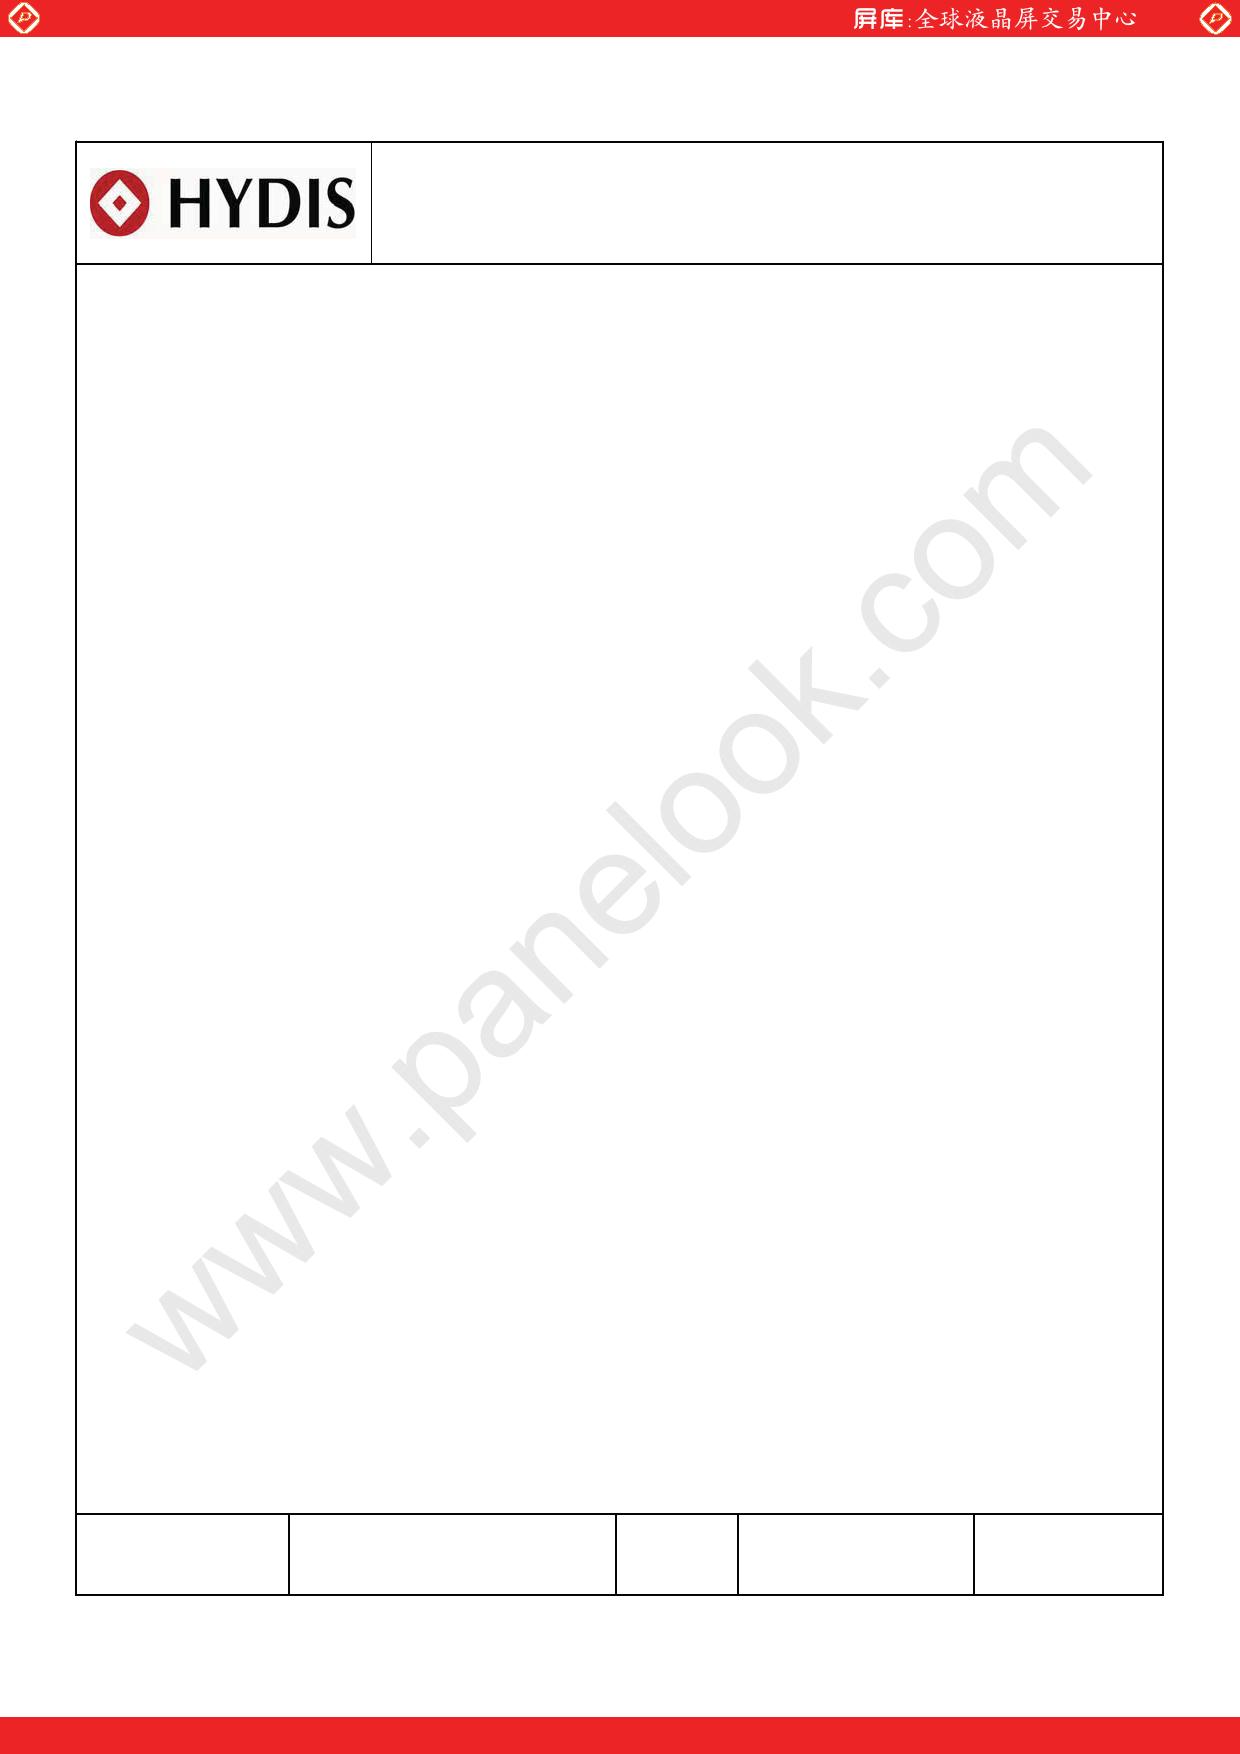 HV121WX5-110 Datasheet, HV121WX5-110 PDF,ピン配置, 機能